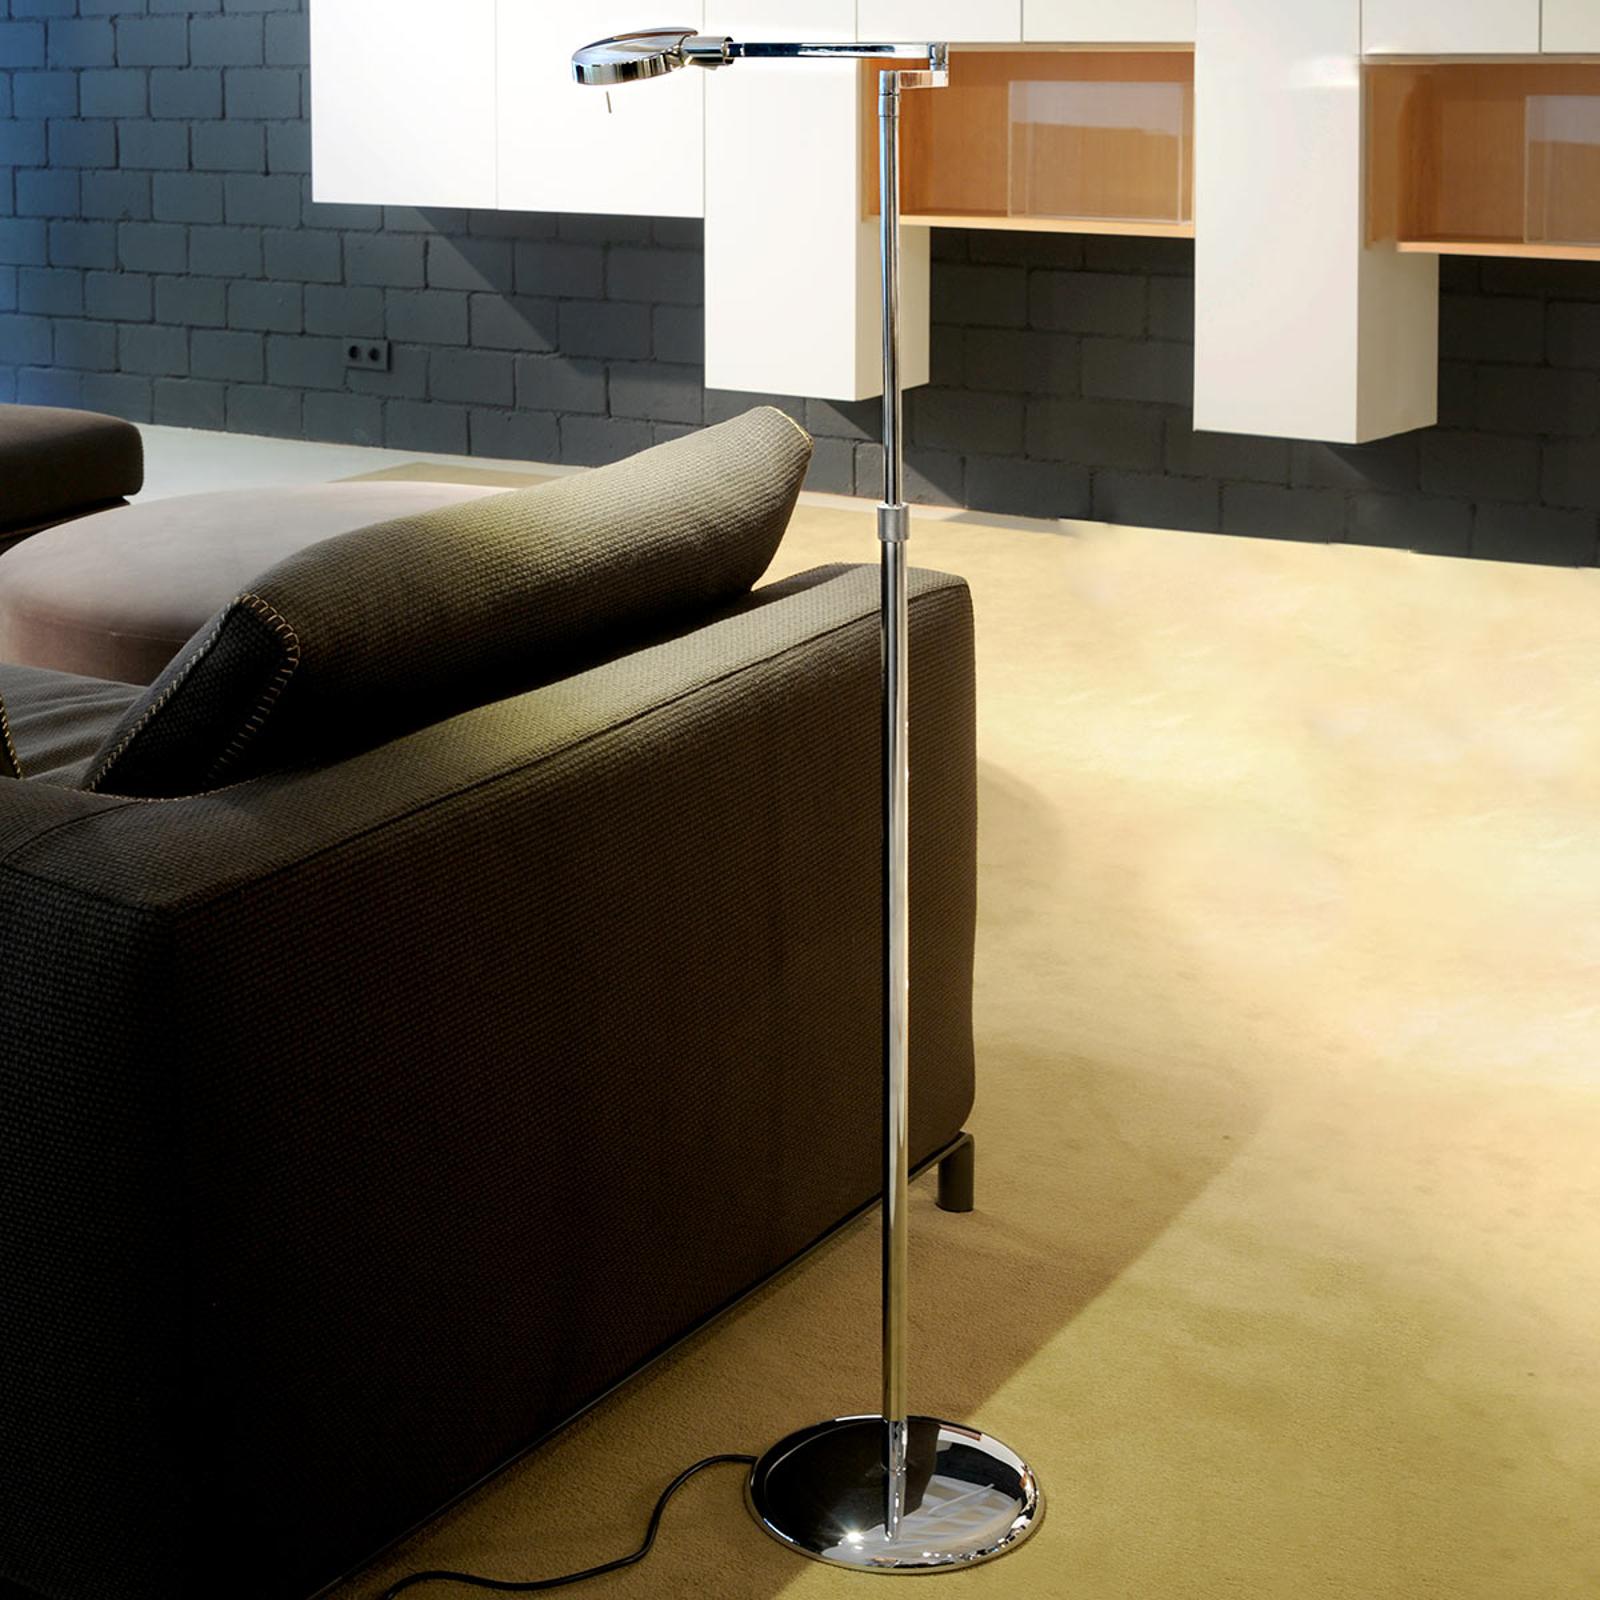 3-LED gulvlampe høydejusterbar 1 lys